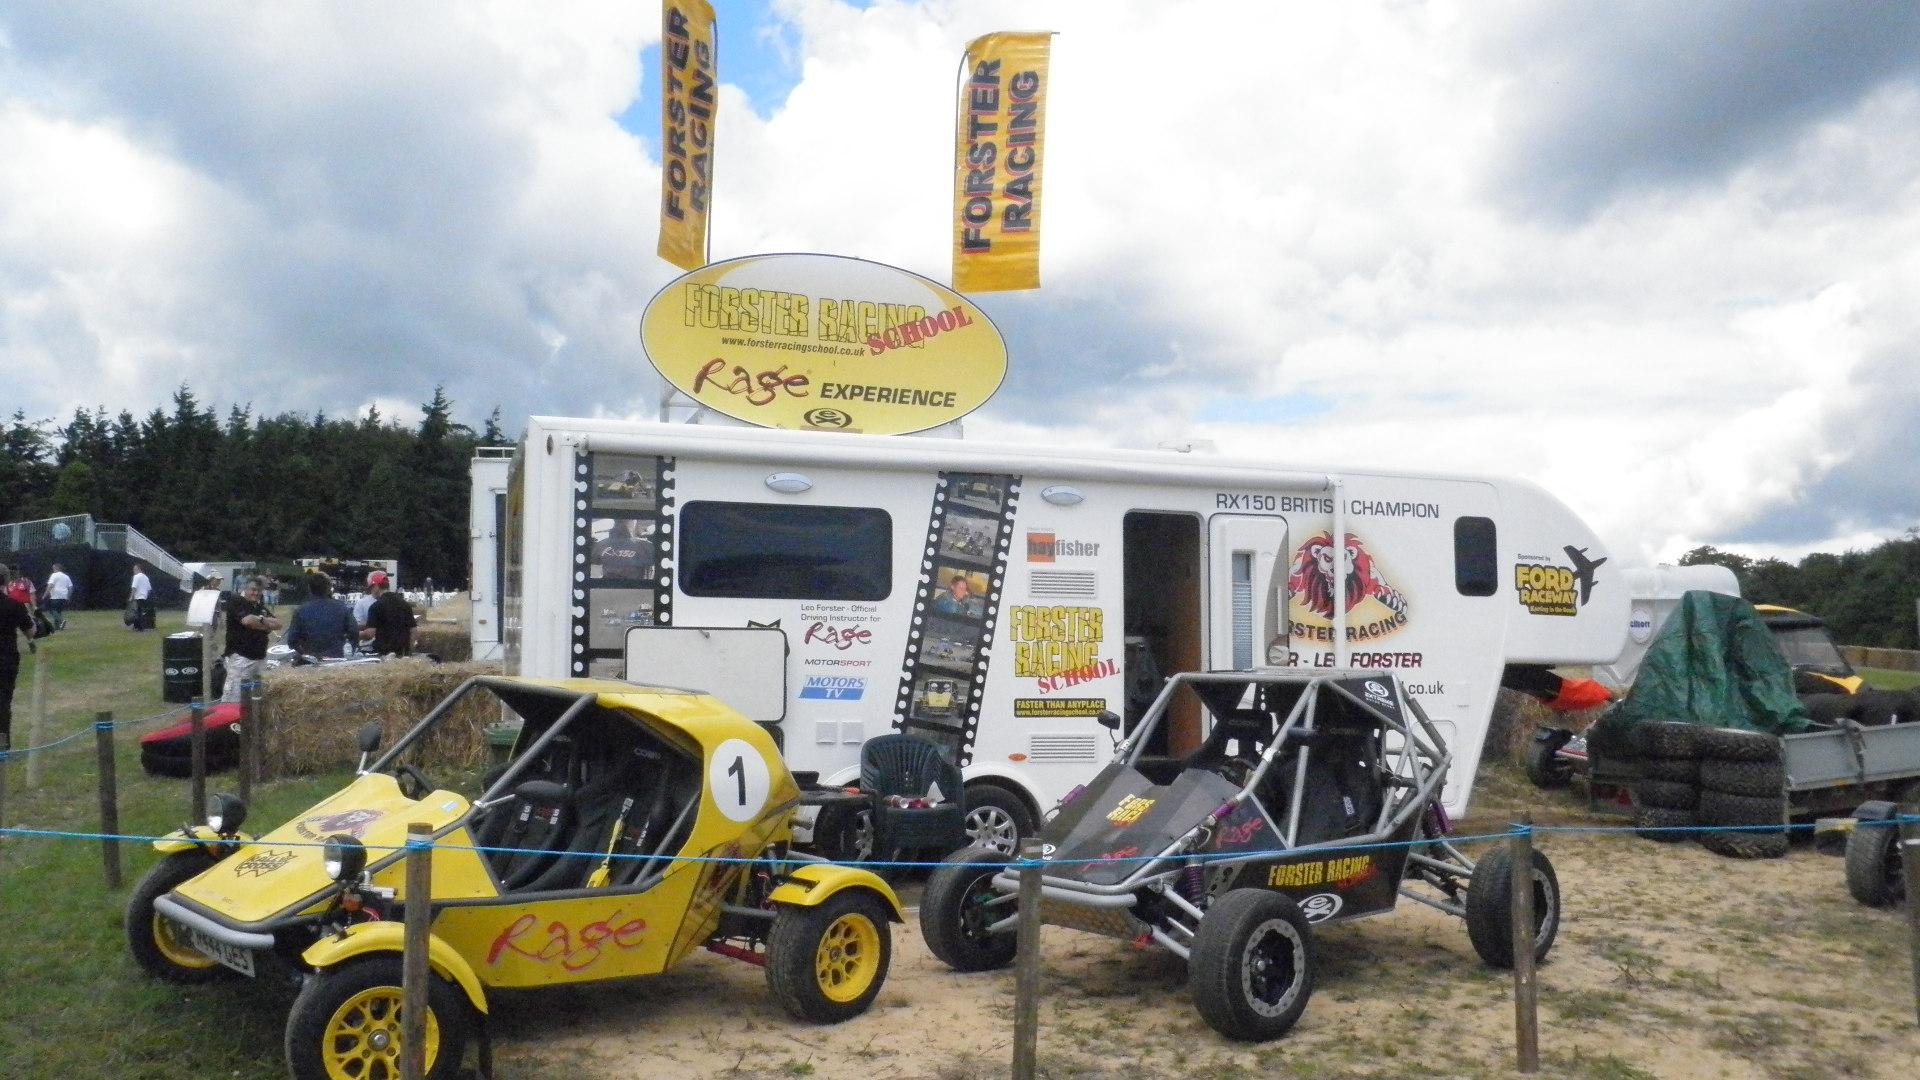 rage buggying british rallycross forster racing school. Black Bedroom Furniture Sets. Home Design Ideas